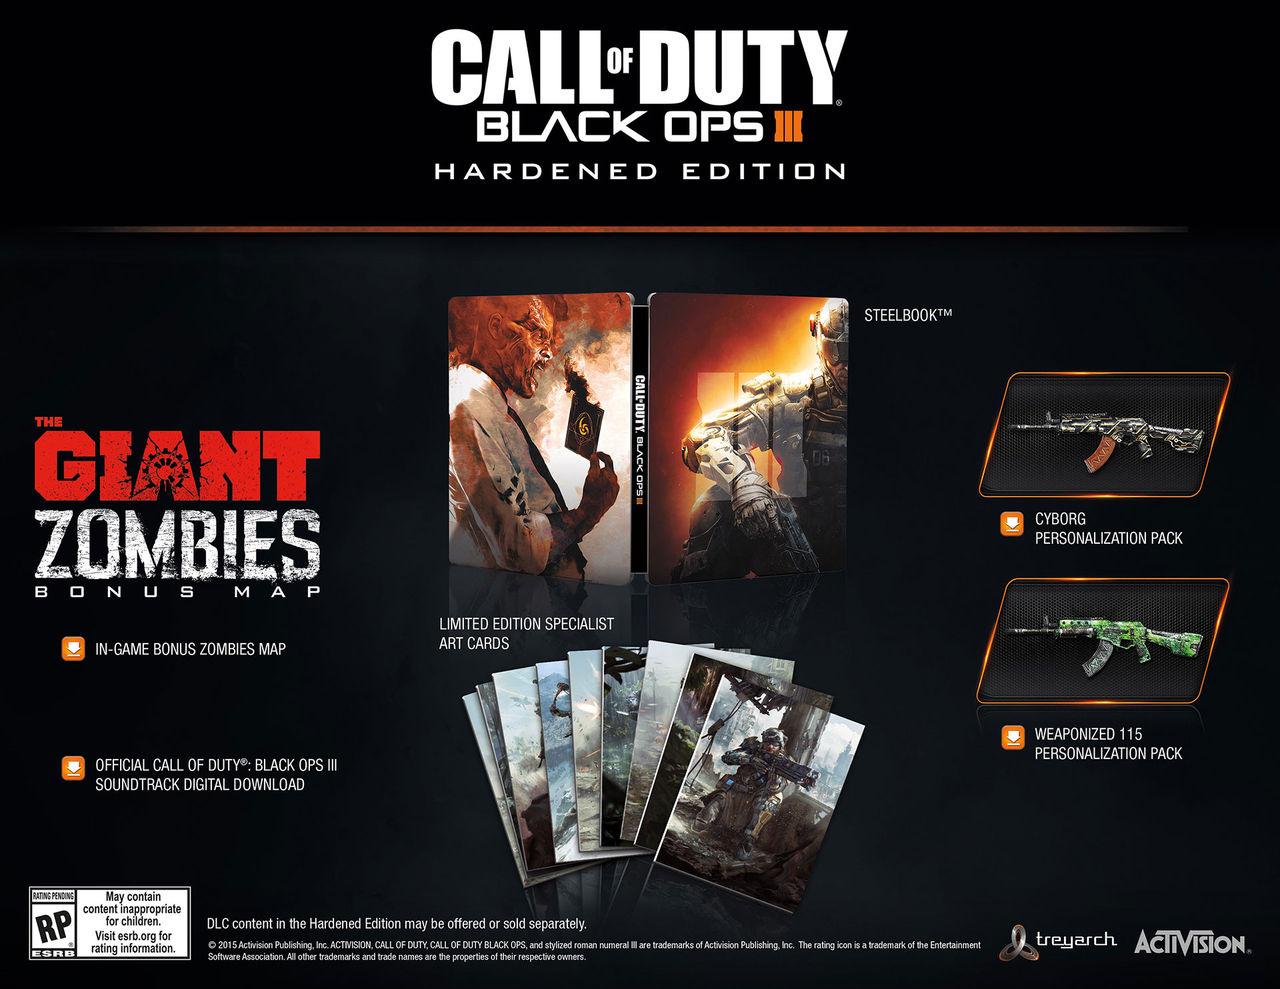 Zombieläge för Call of Duty: Black Ops III presenterat